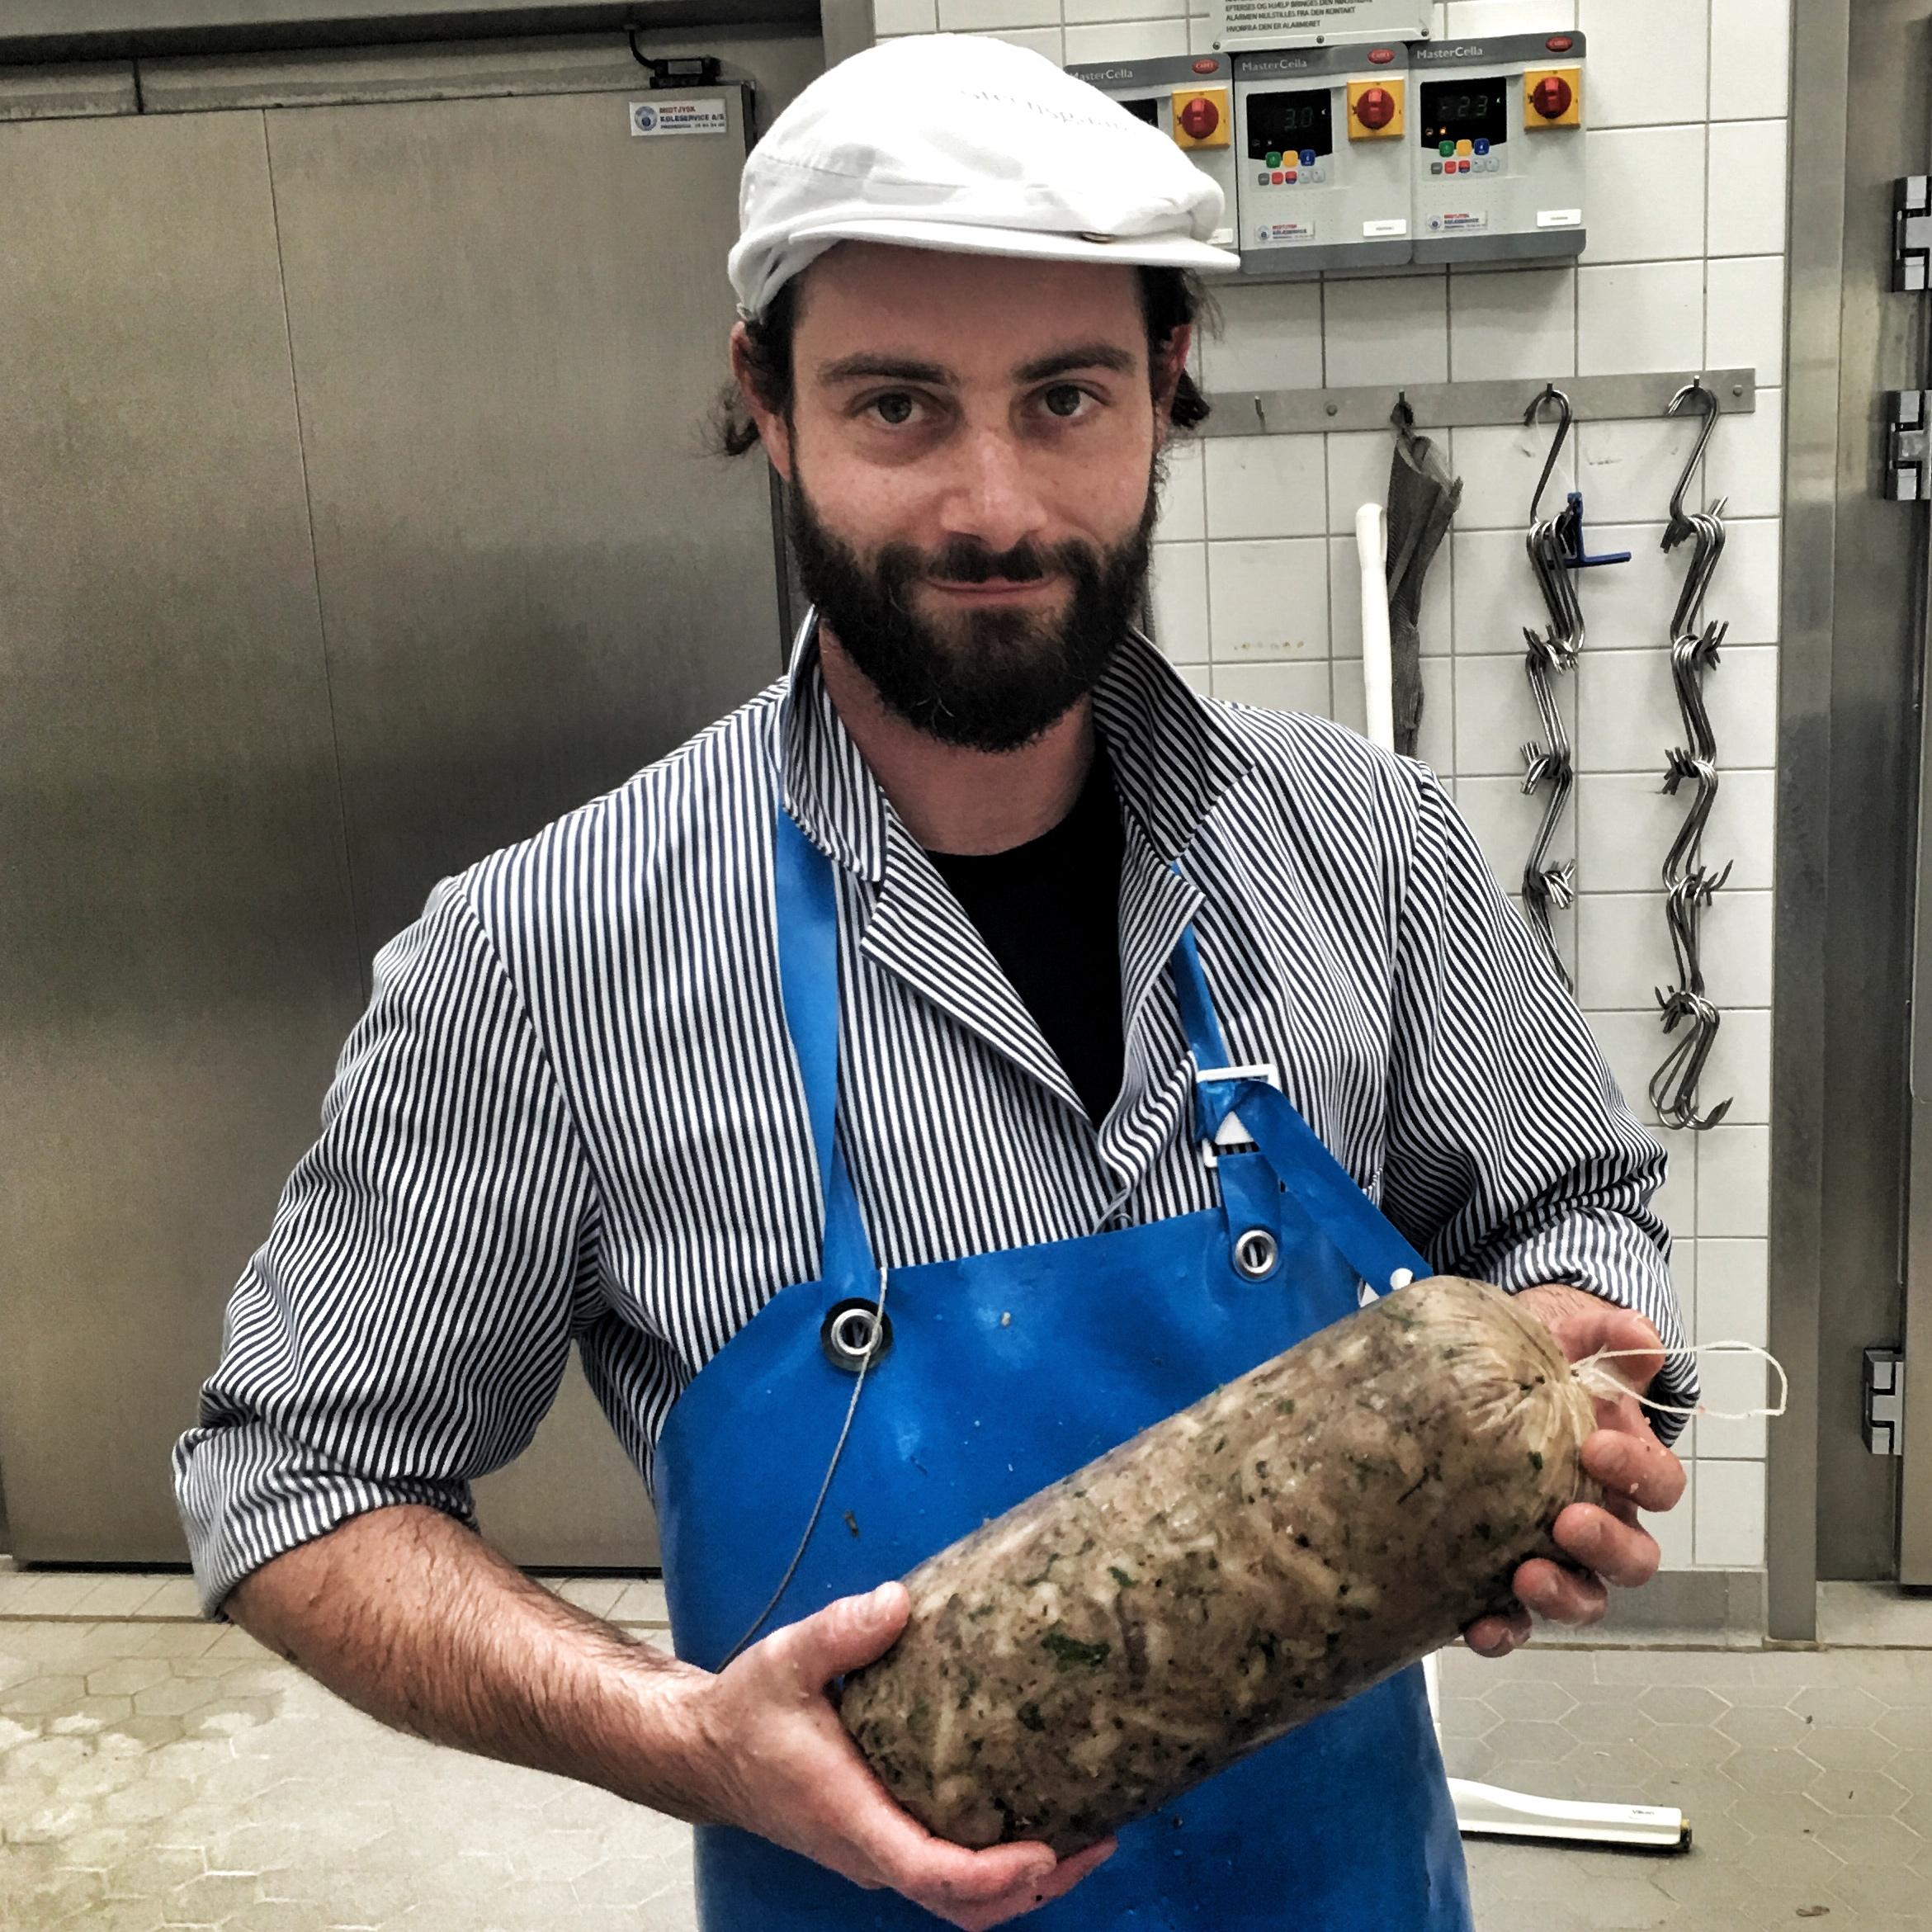 Ollie, the German butcher holding a Coppa di Testa, an Italian version of headcheese.